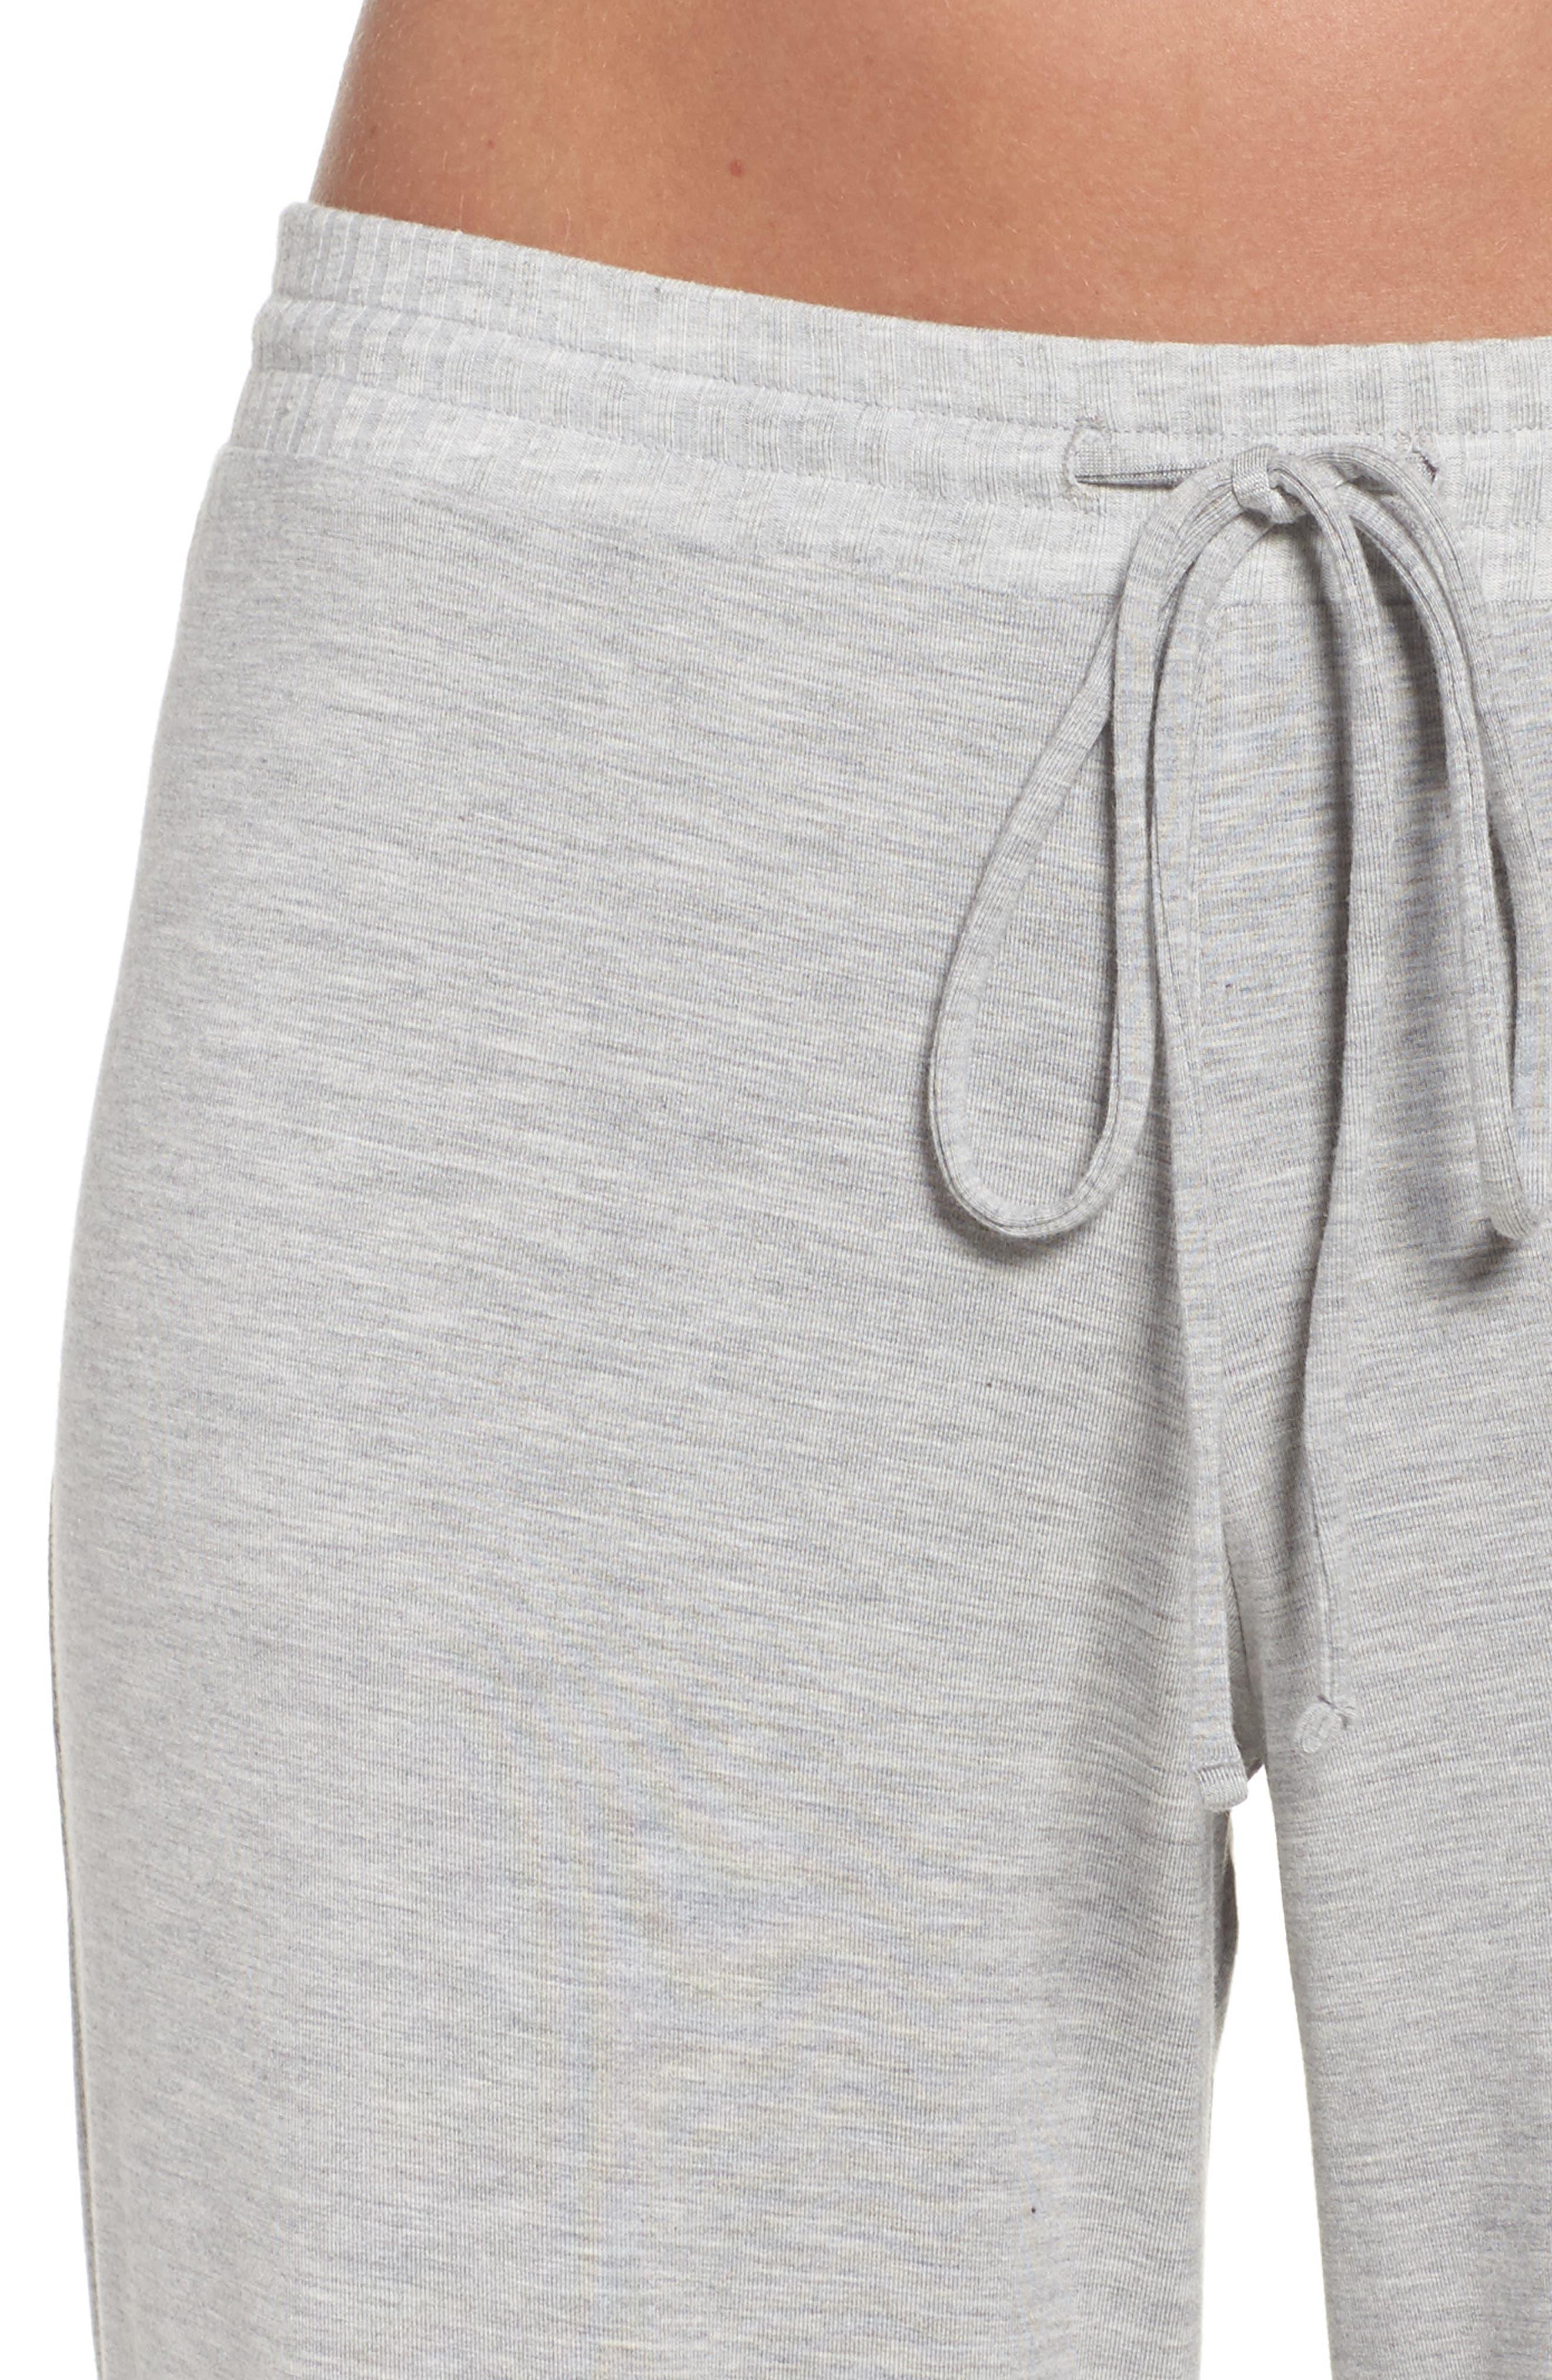 Chelsea Lounge Pants,                             Alternate thumbnail 8, color,